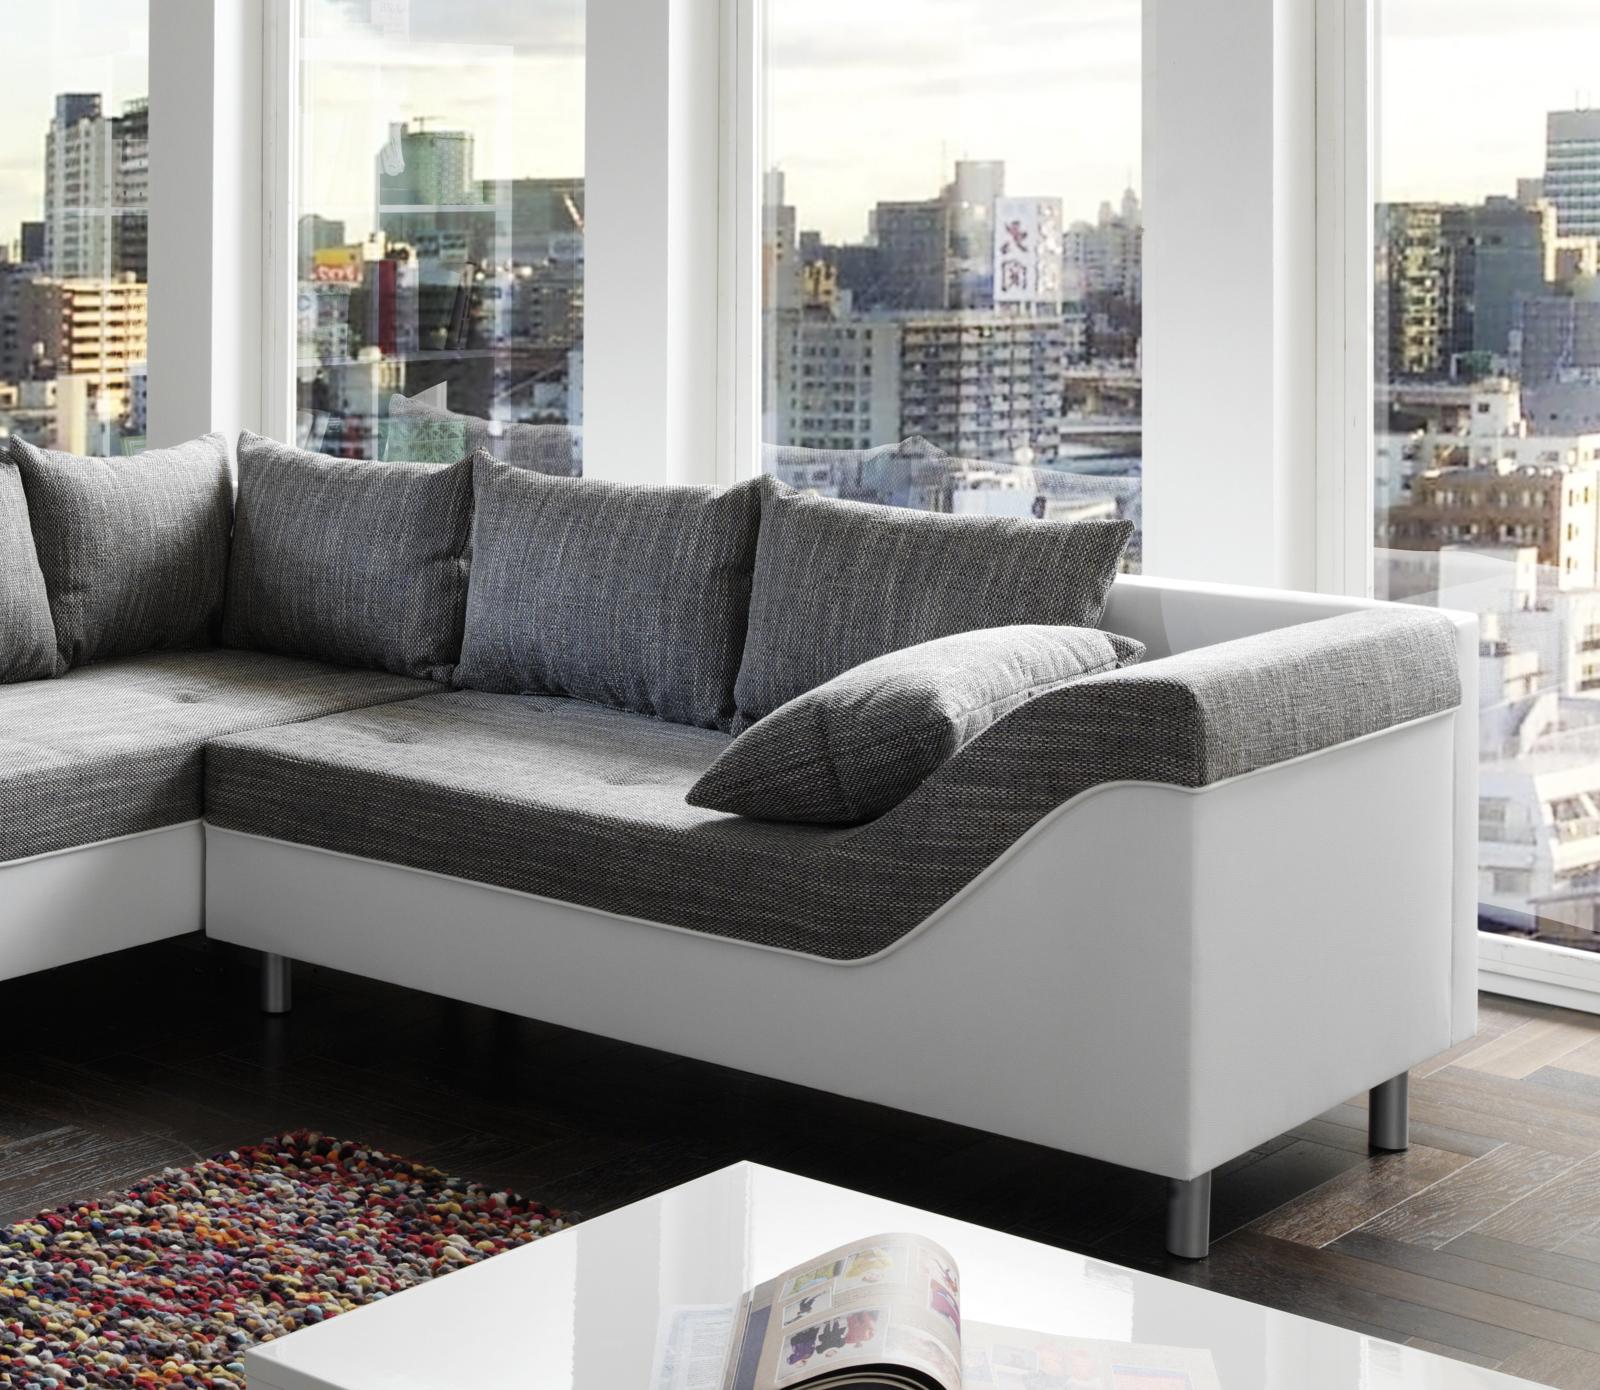 sam sofa grau wei wohnlandschaft phil 183 x 315 x 243 cm. Black Bedroom Furniture Sets. Home Design Ideas